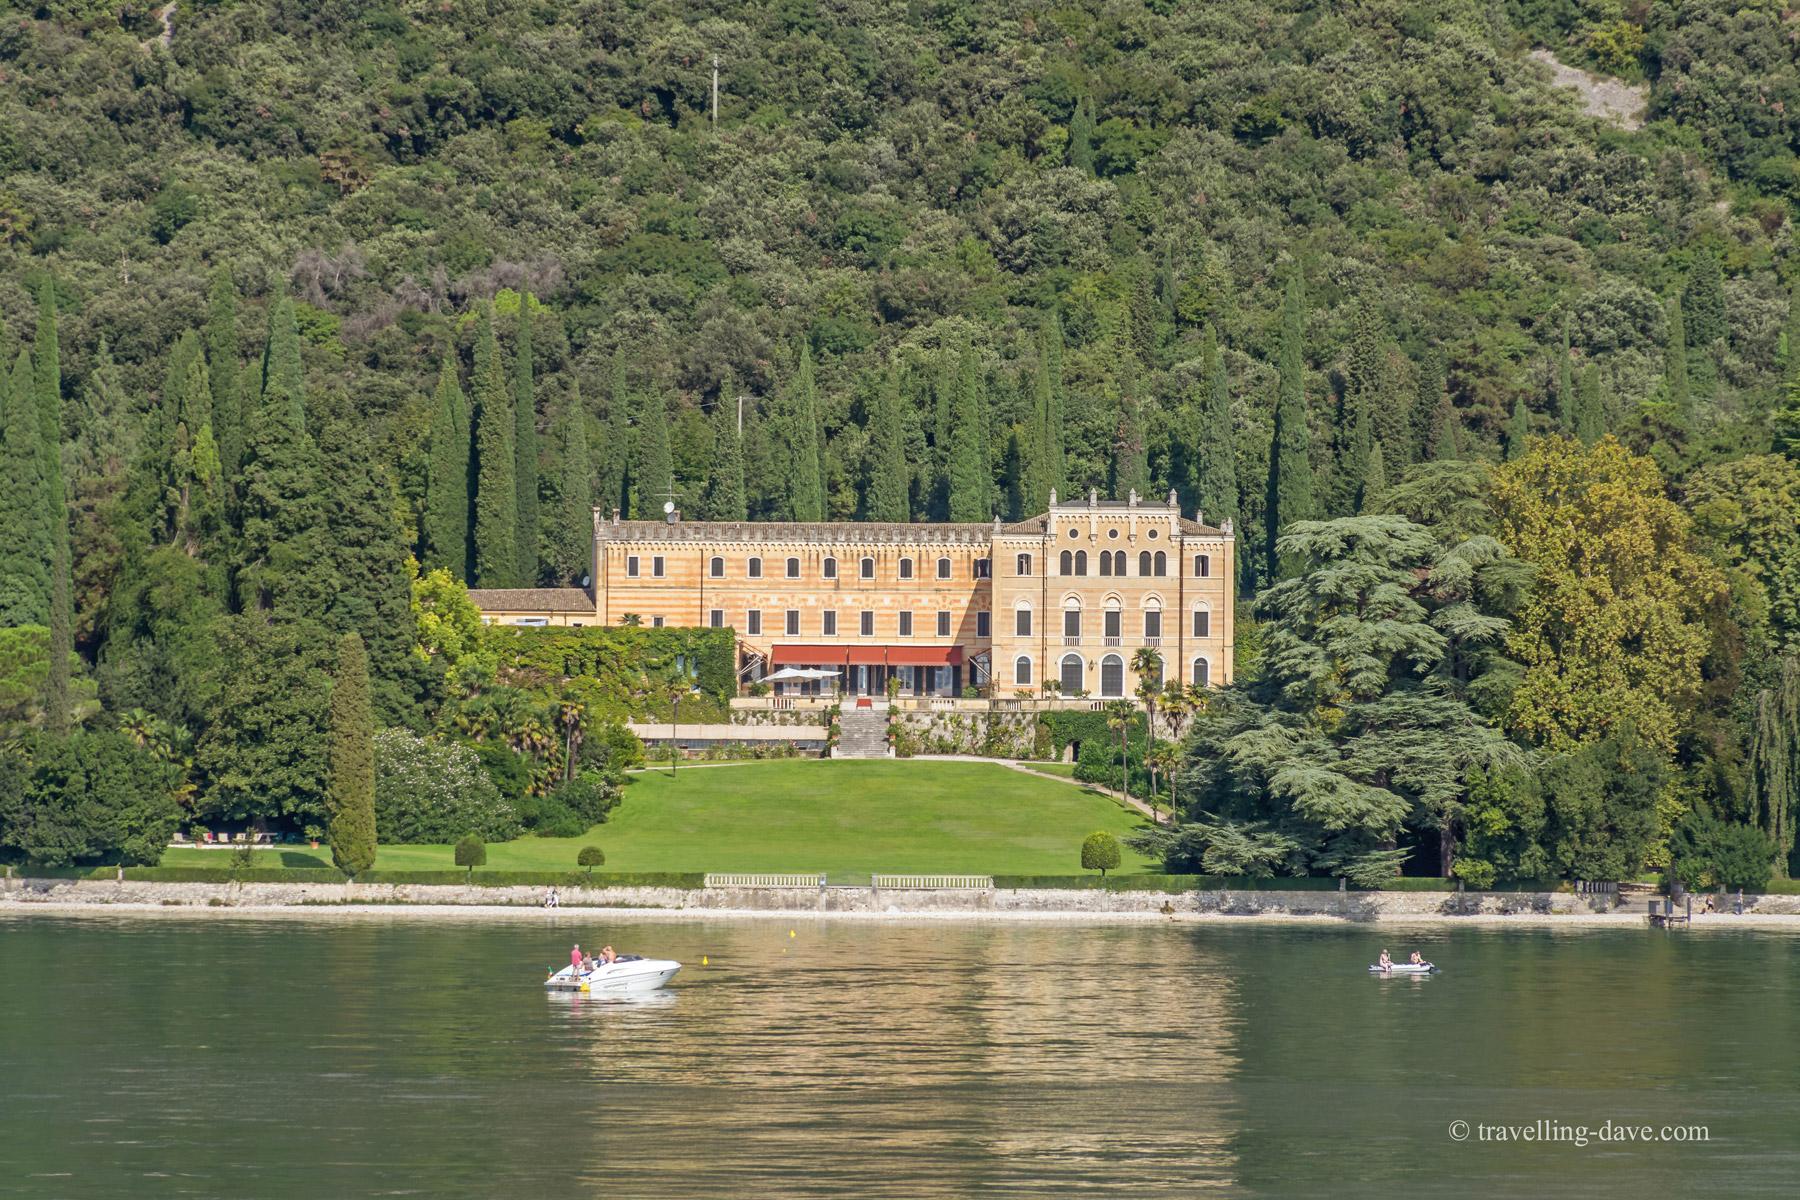 One of the beautiful lakeside villas on Lake Garda